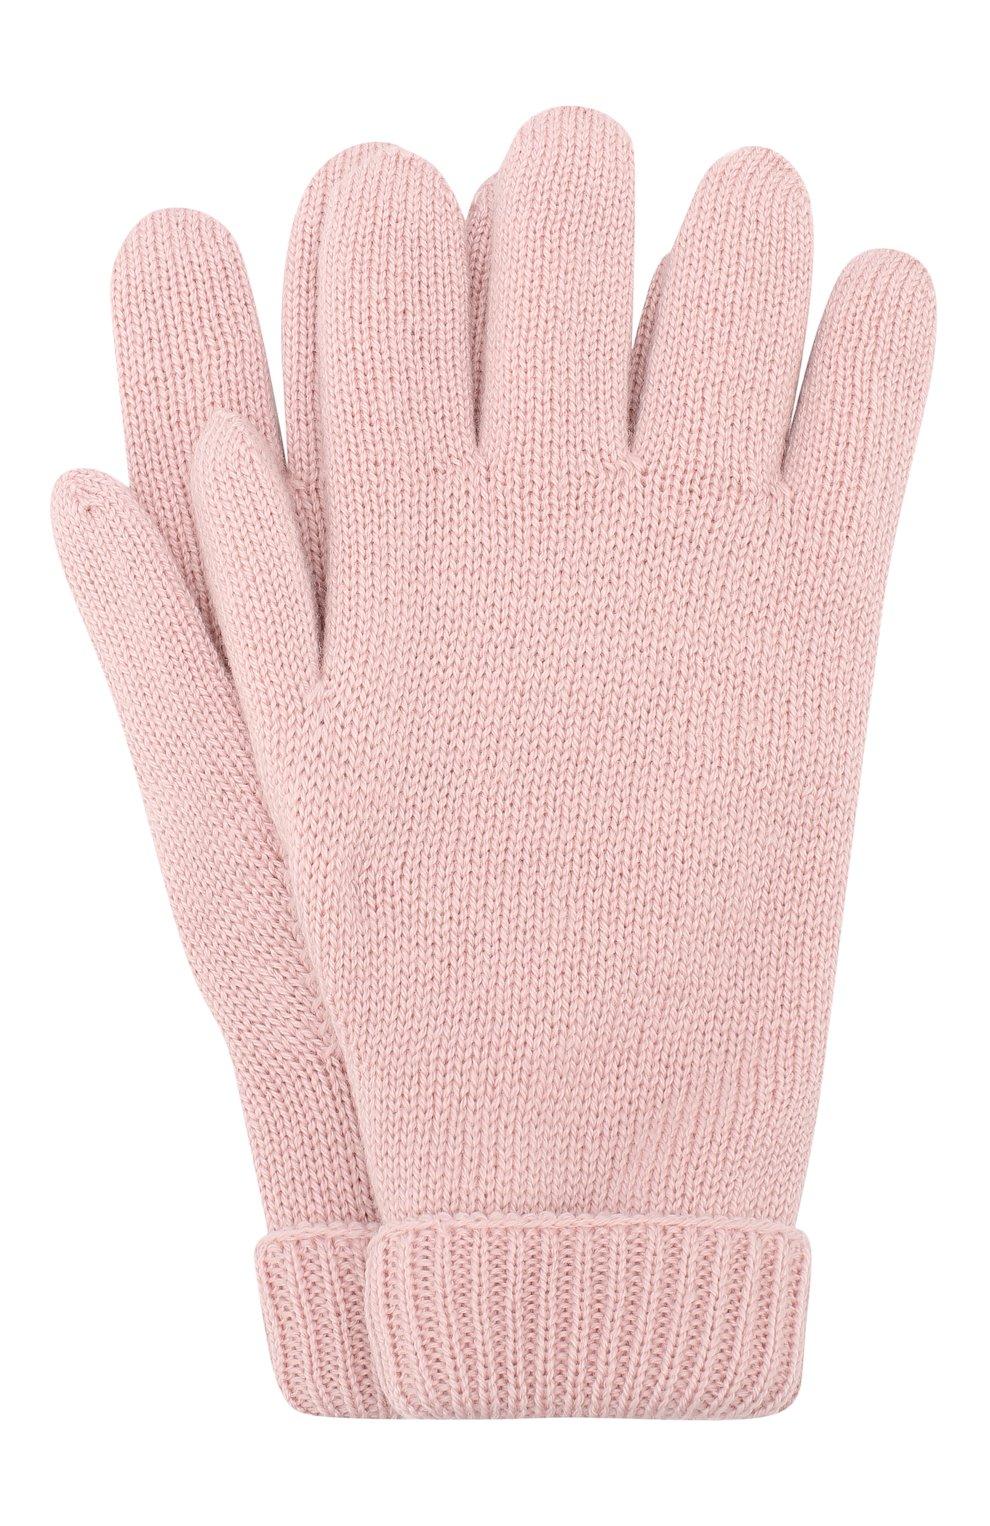 Детские шерстяные перчатки IL TRENINO розового цвета, арт. 19 9008/E0   Фото 1